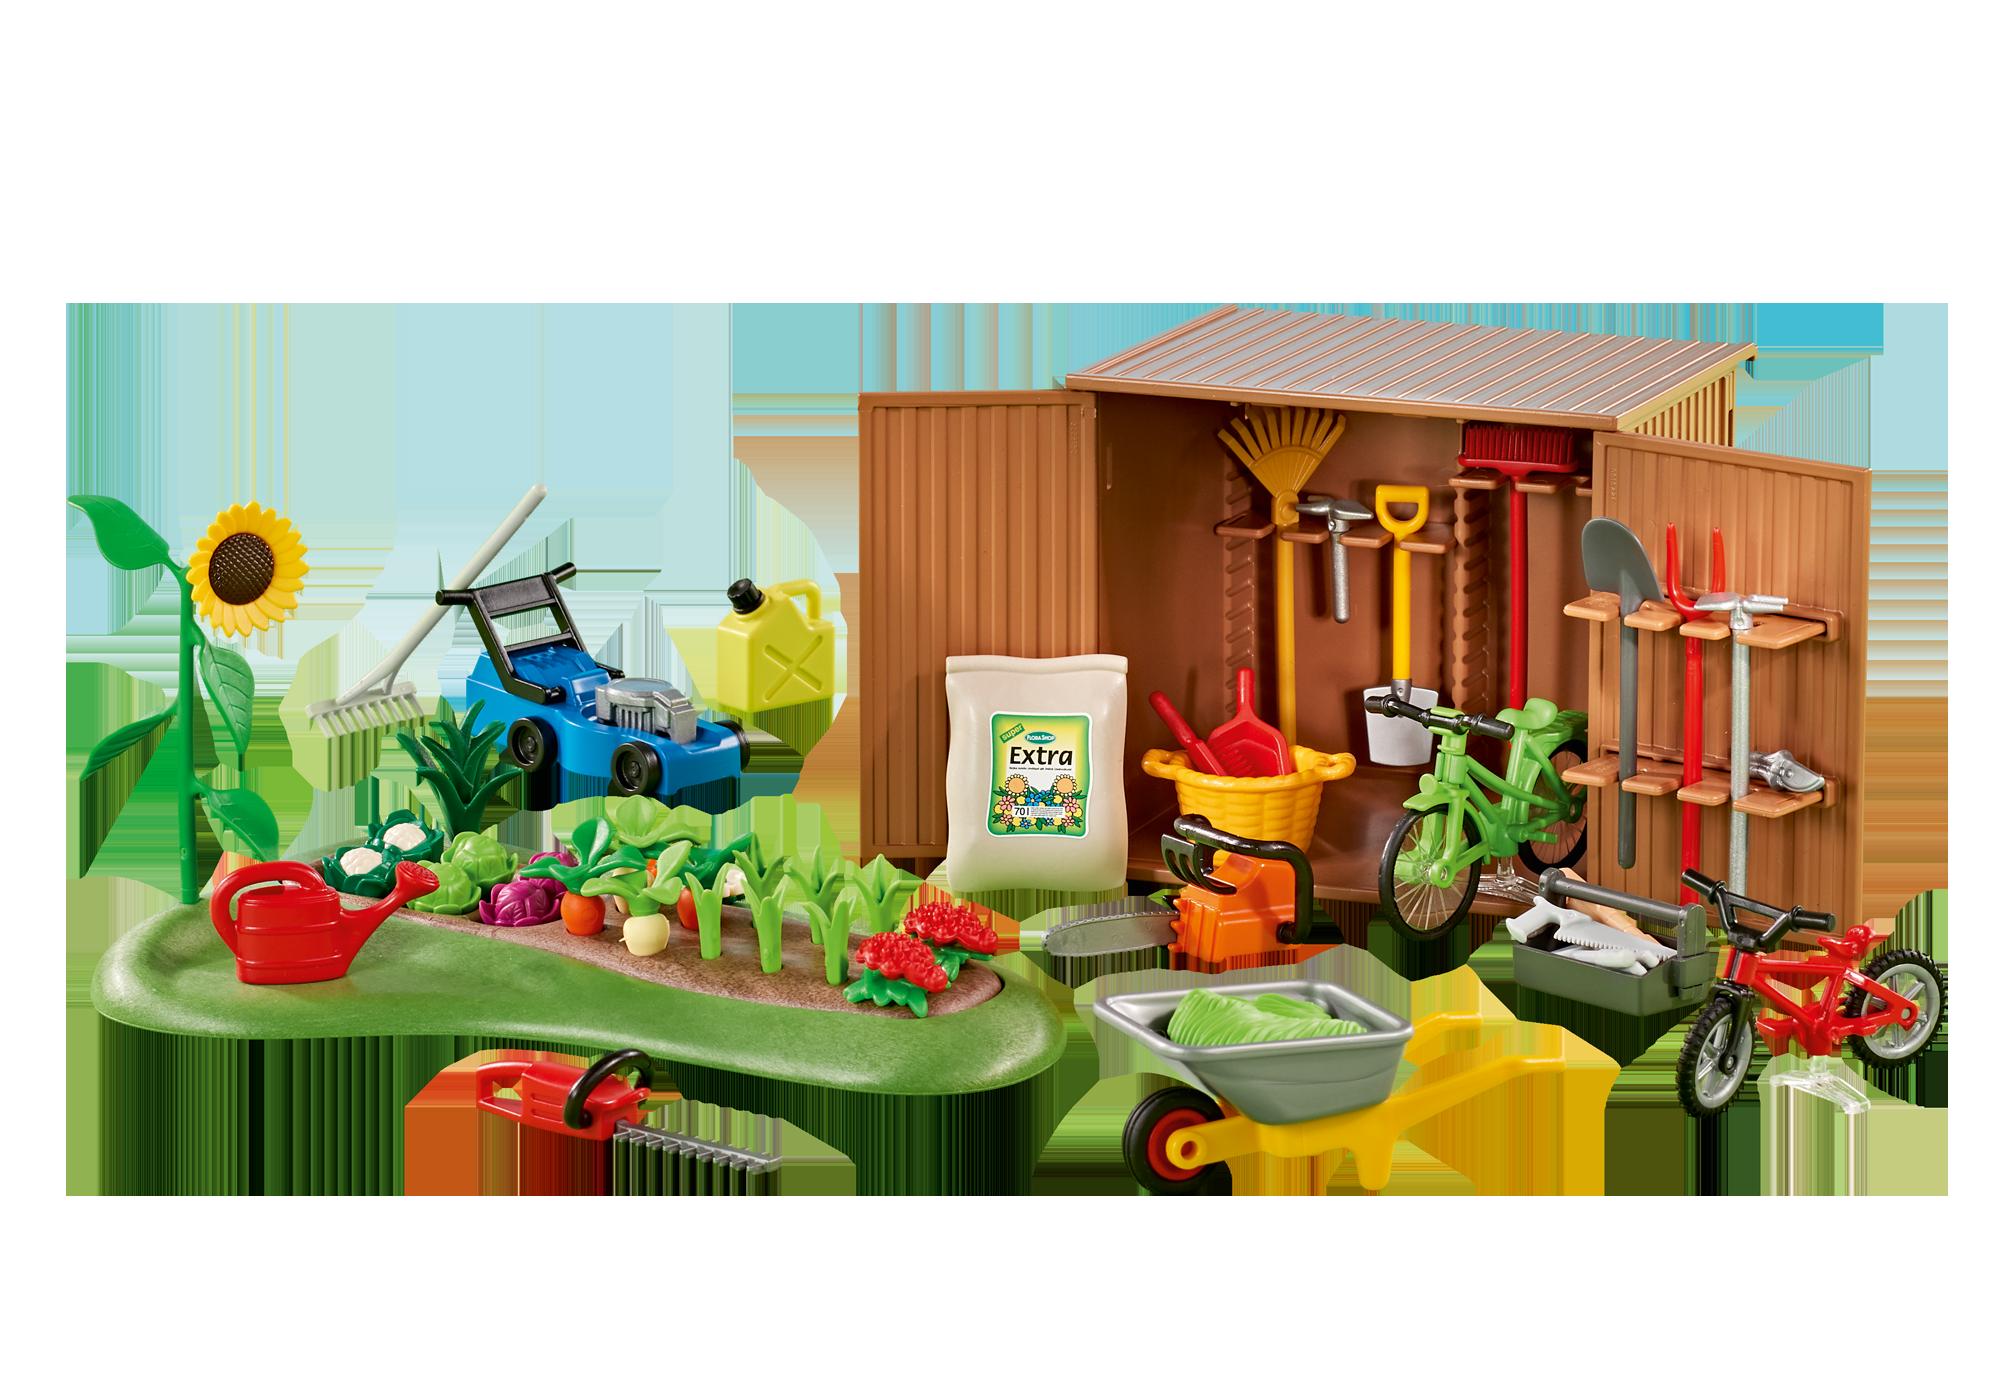 http://media.playmobil.com/i/playmobil/6558_product_detail/Cabane à outils avec petit potager